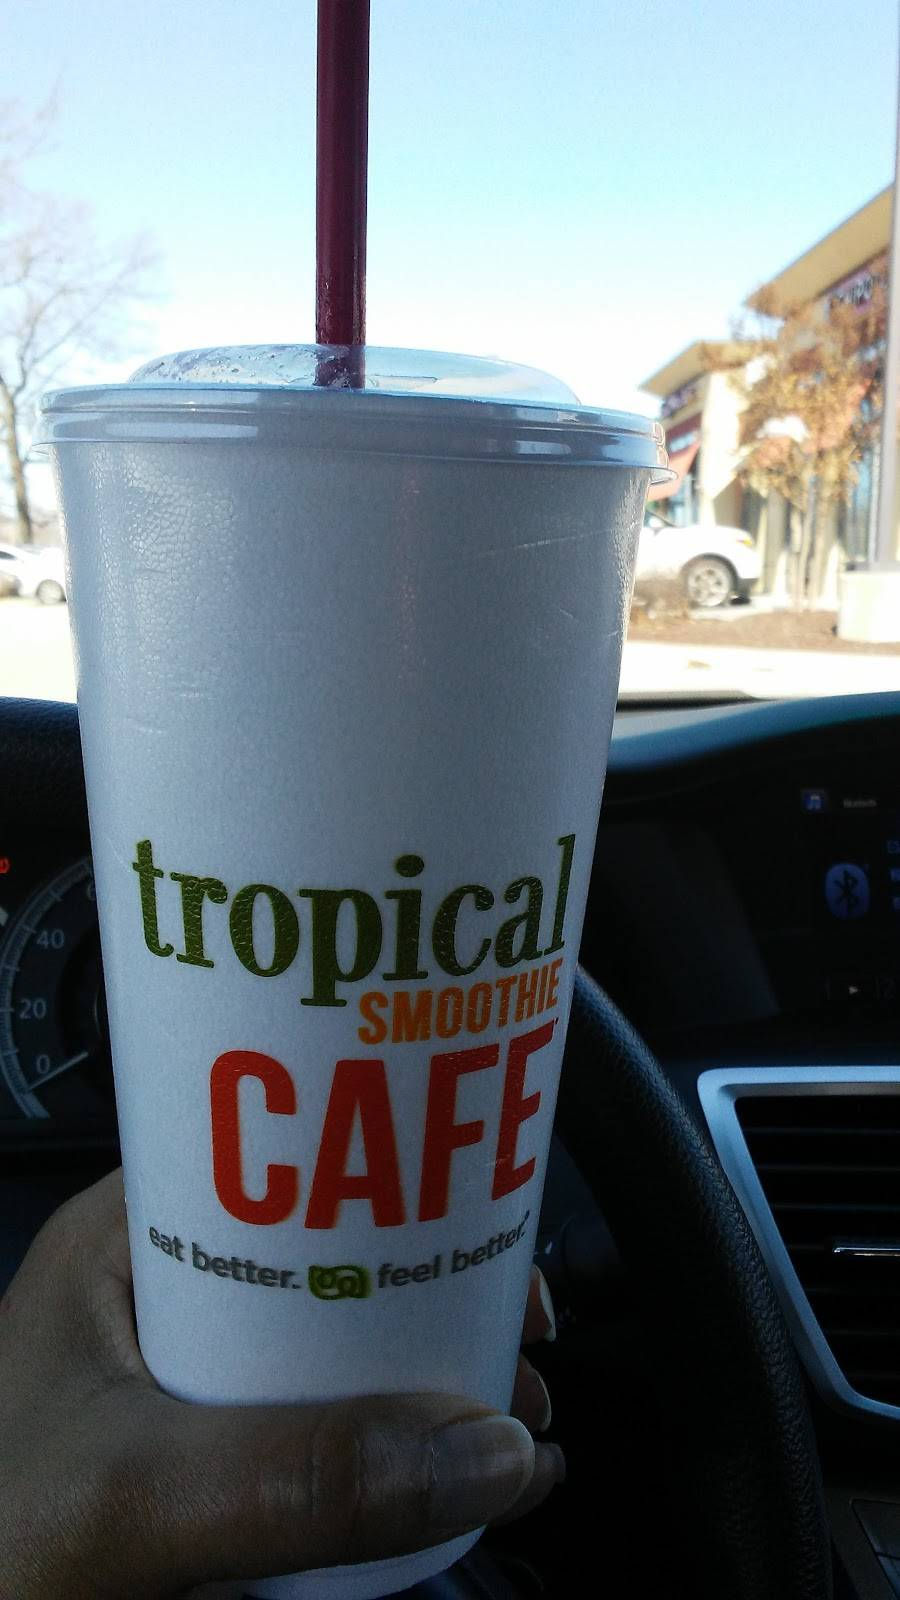 Chipotle Mexican Grill | restaurant | 105 Drury Dr Ste B, La Plata, MD 20646, USA | 3013921924 OR +1 301-392-1924